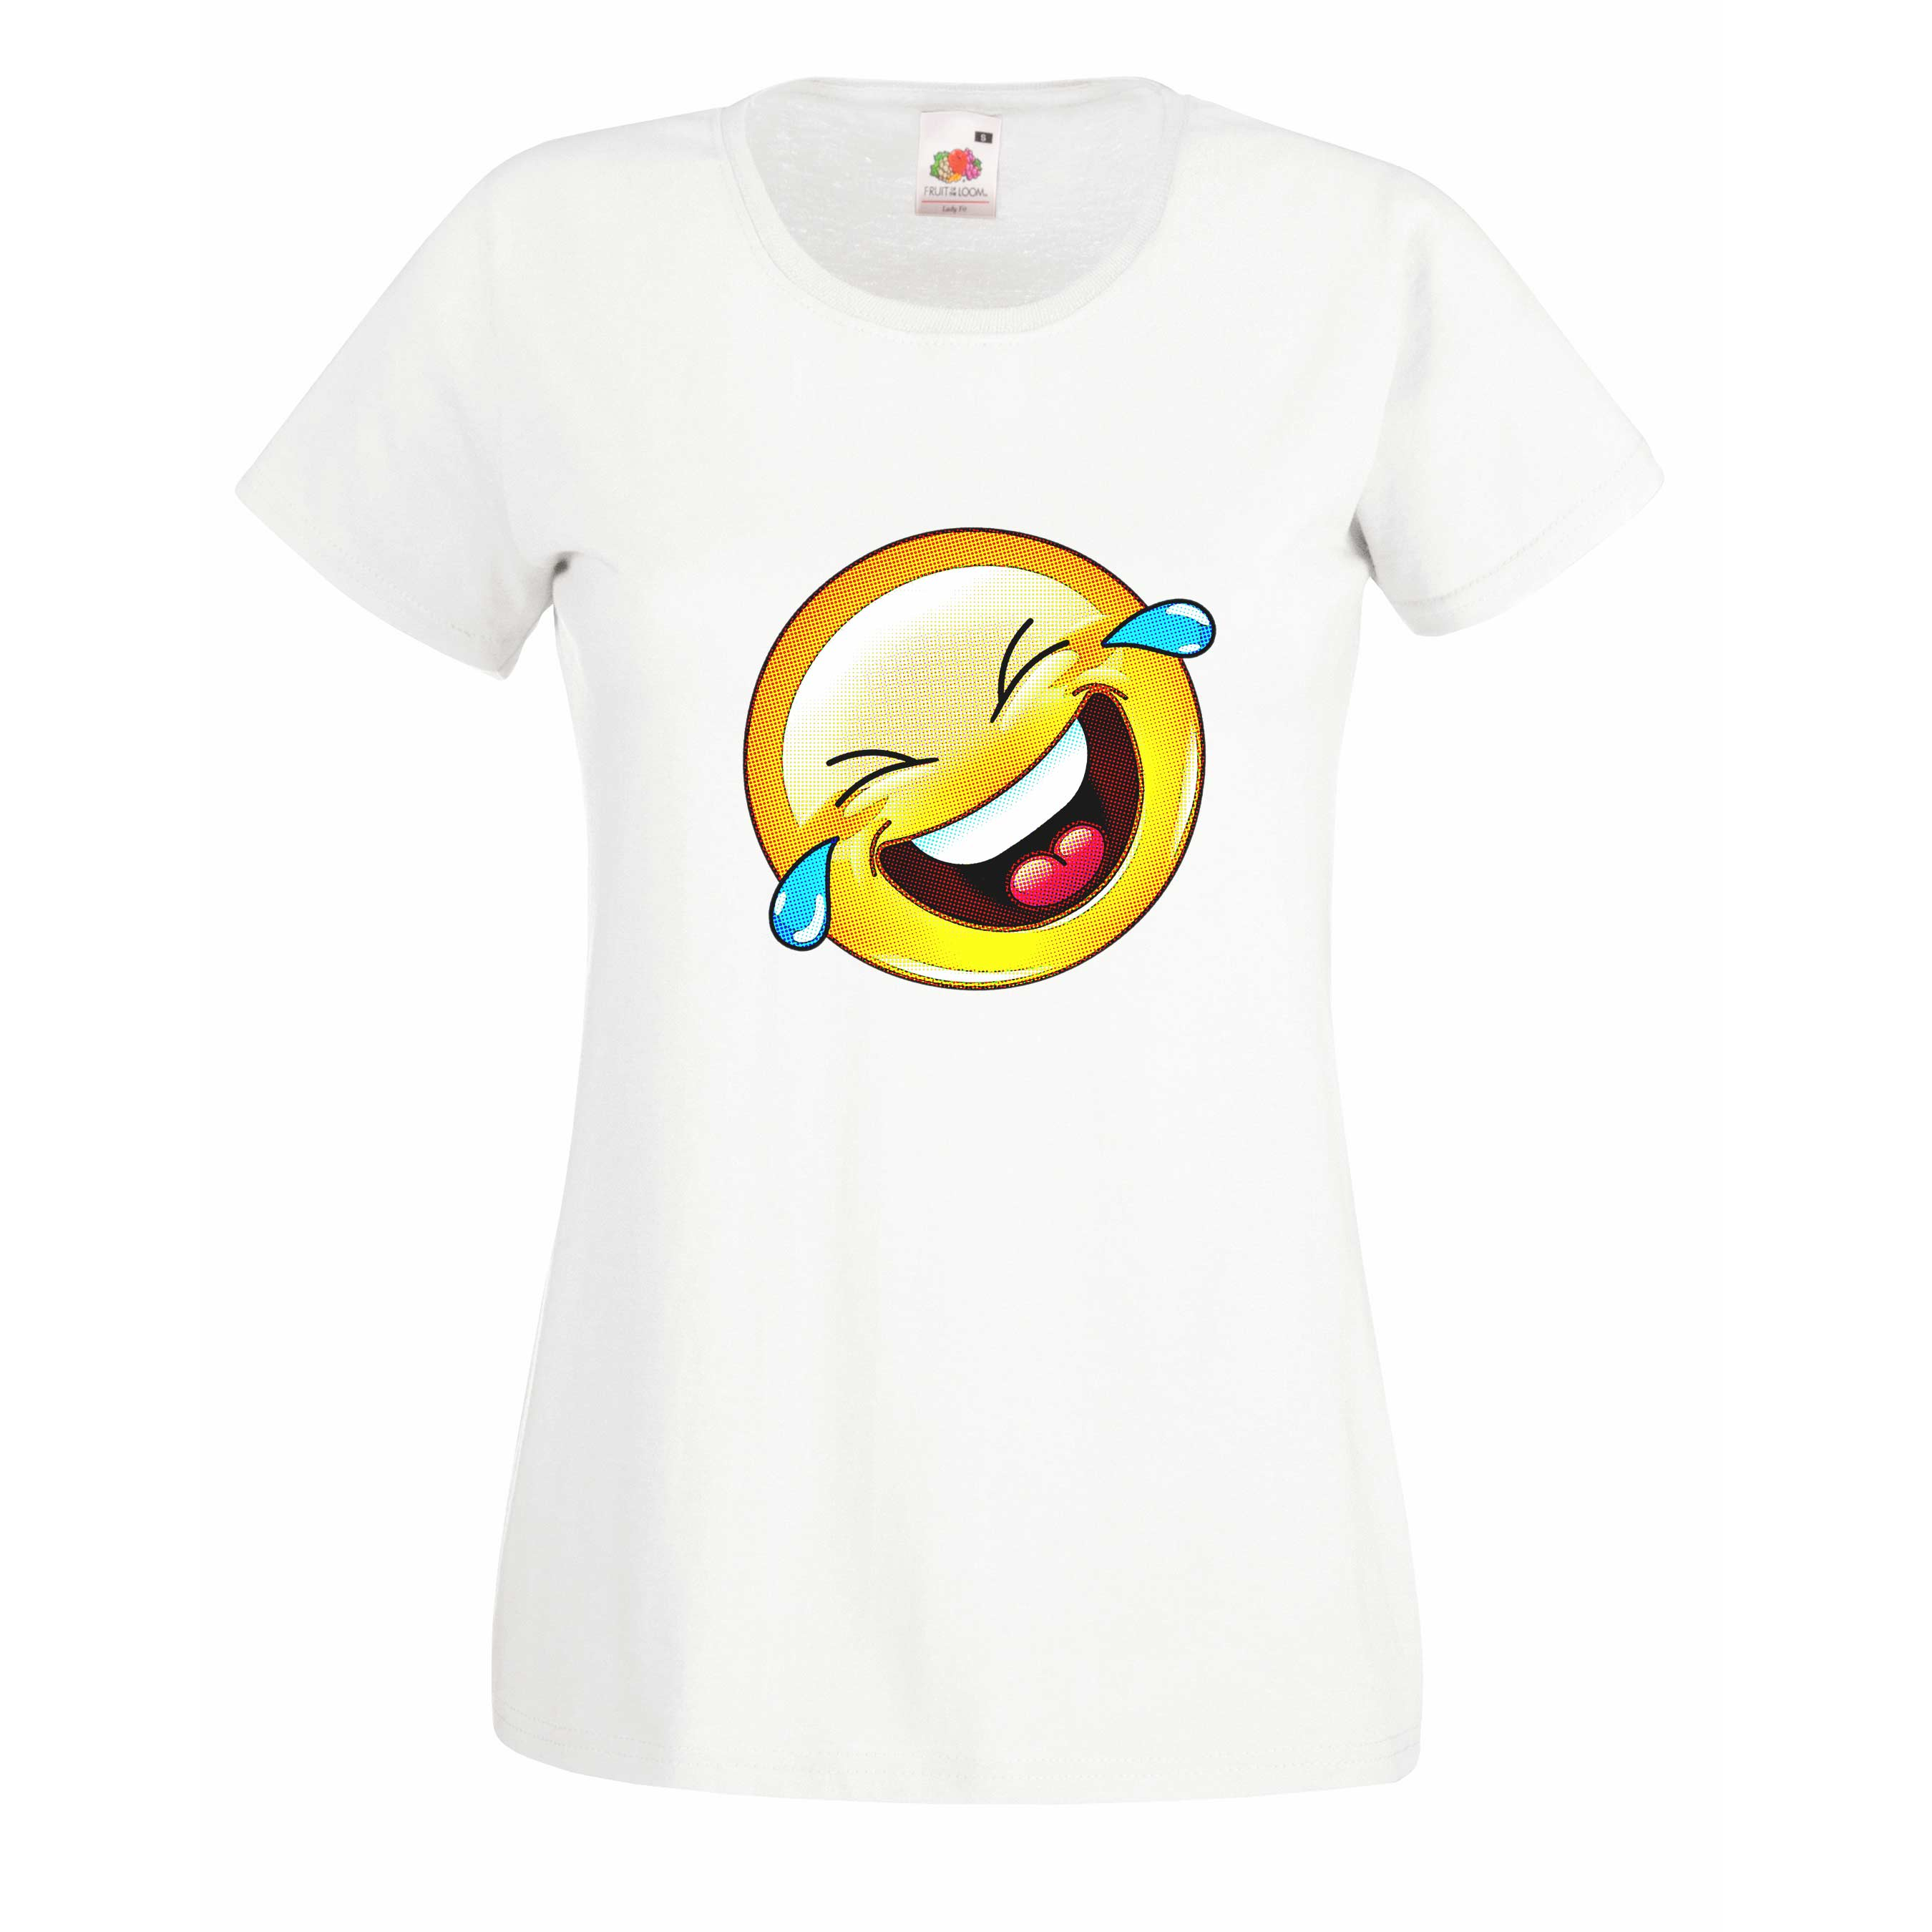 Smiley design for t-shirt, hoodie & sweatshirt